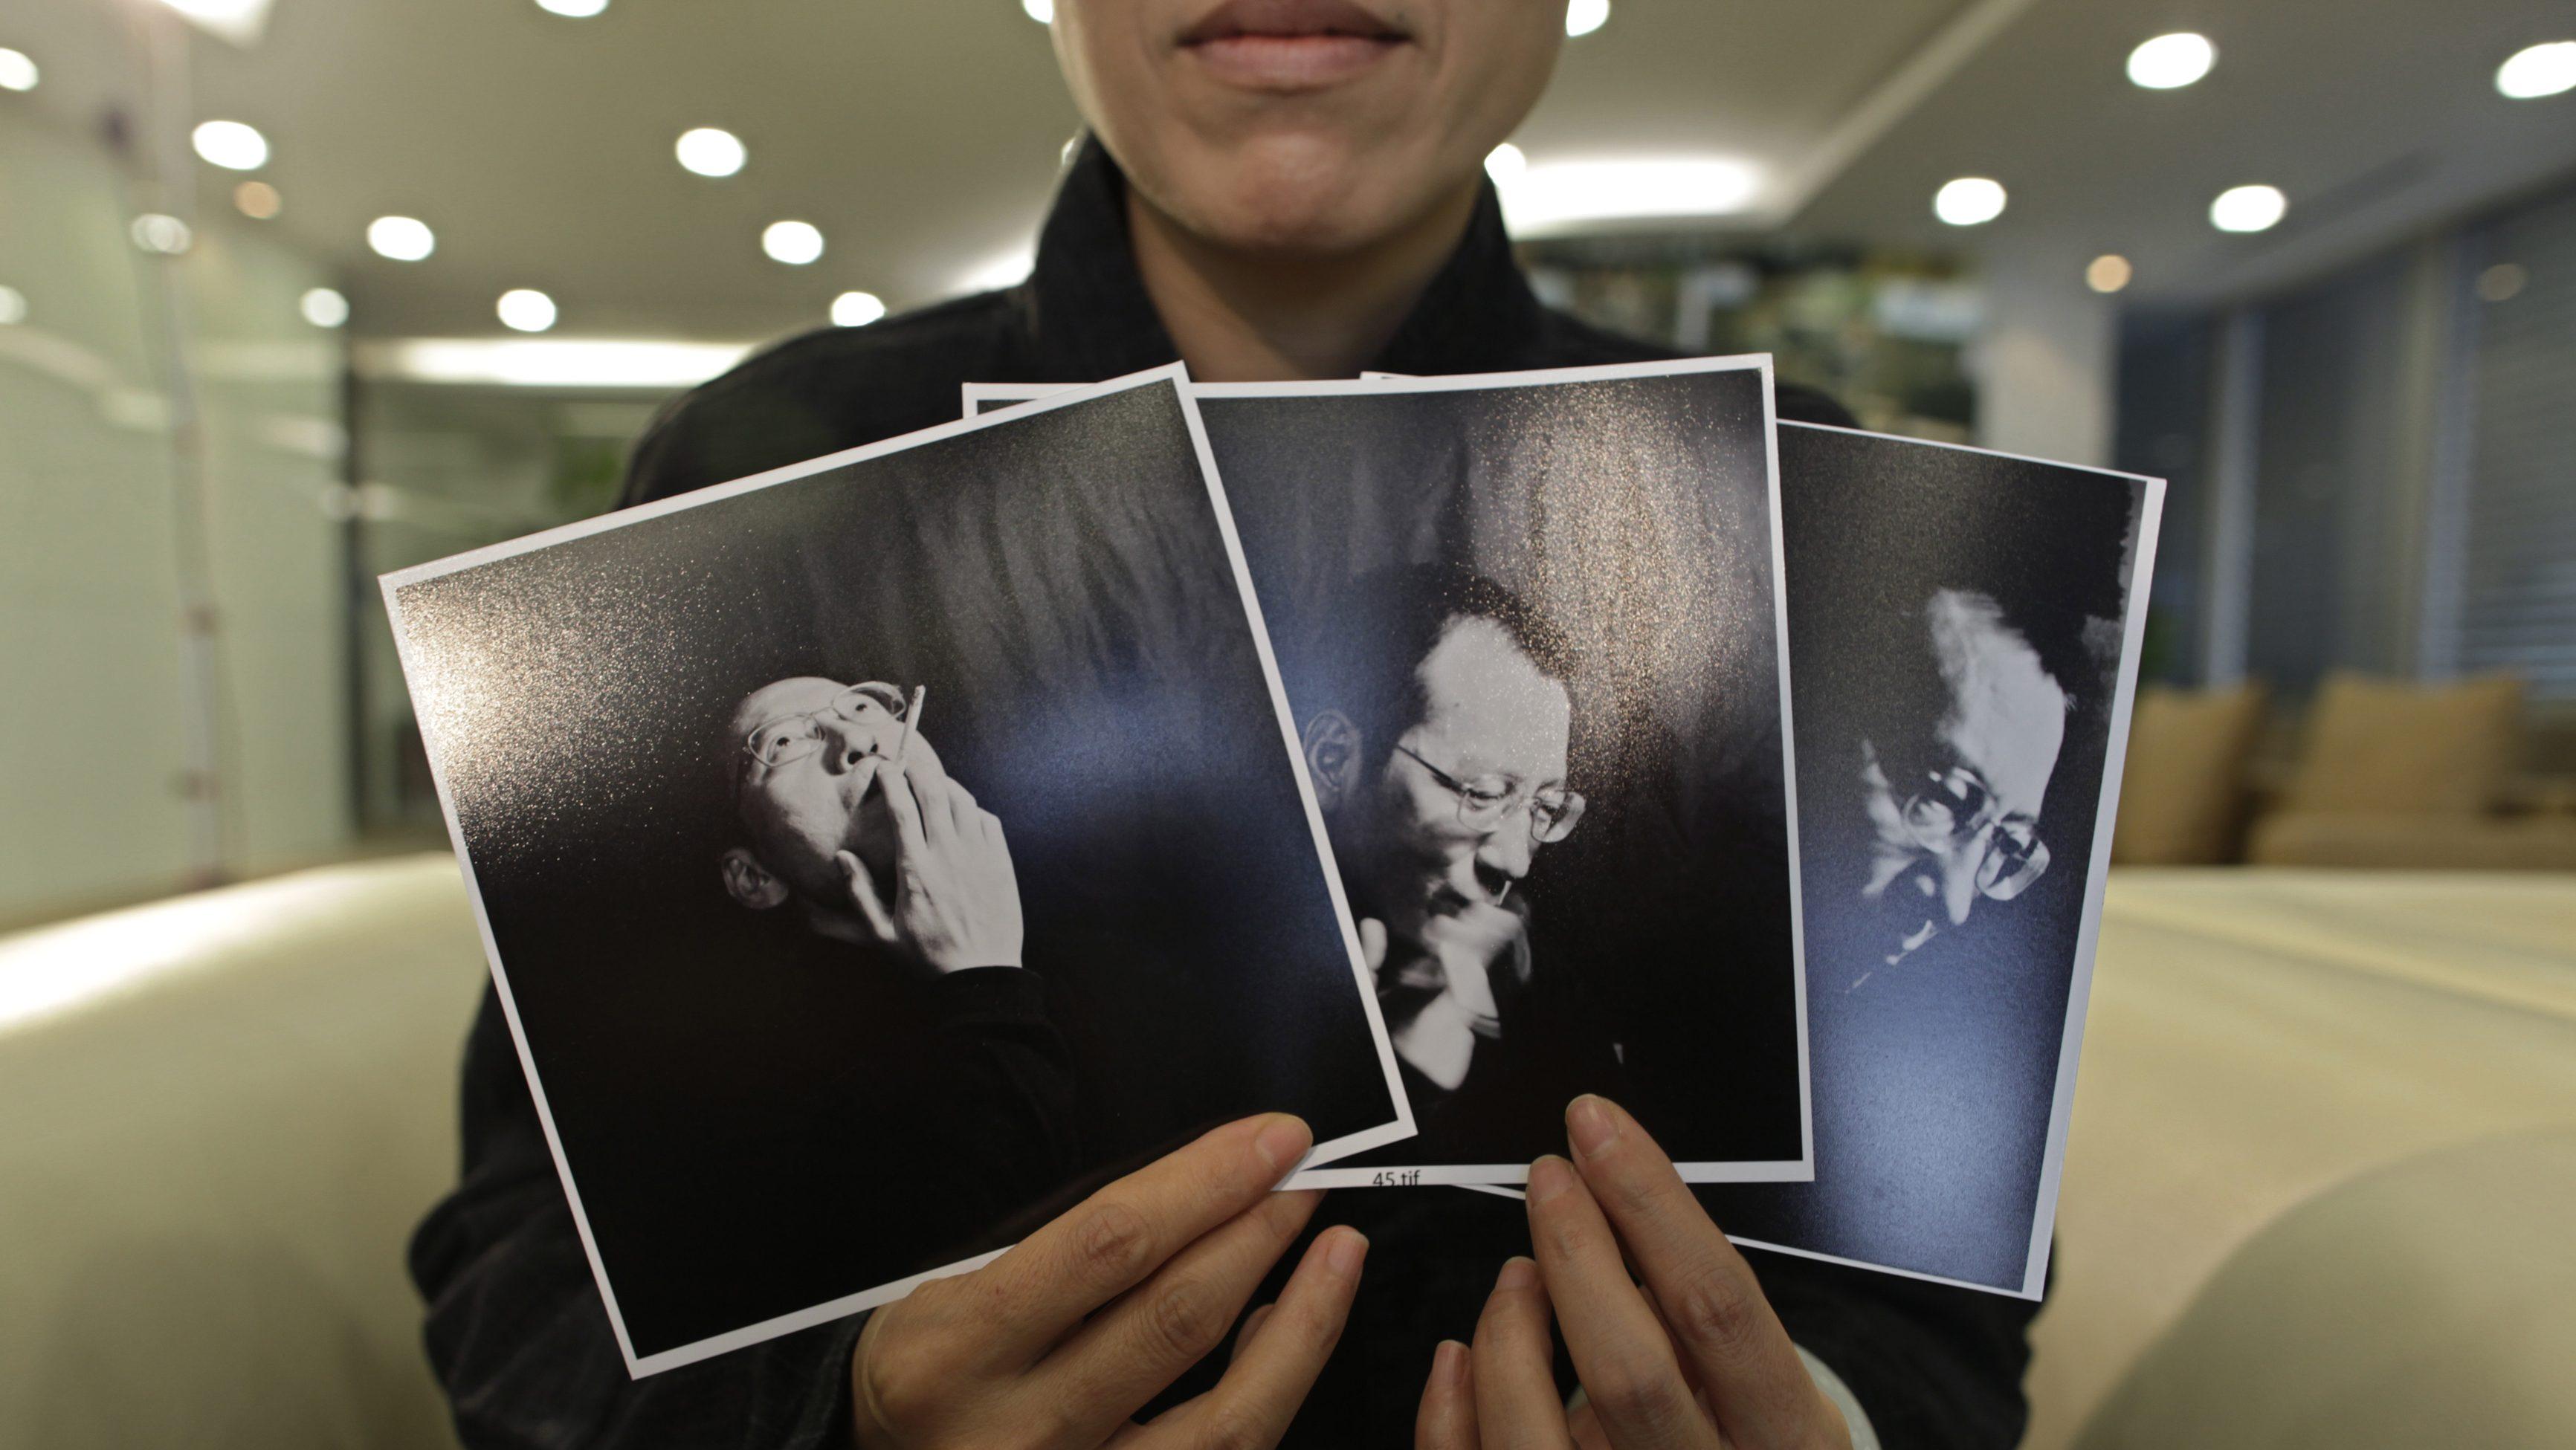 Liu Xia, the wife of Chinese dissident Liu Xiaobo